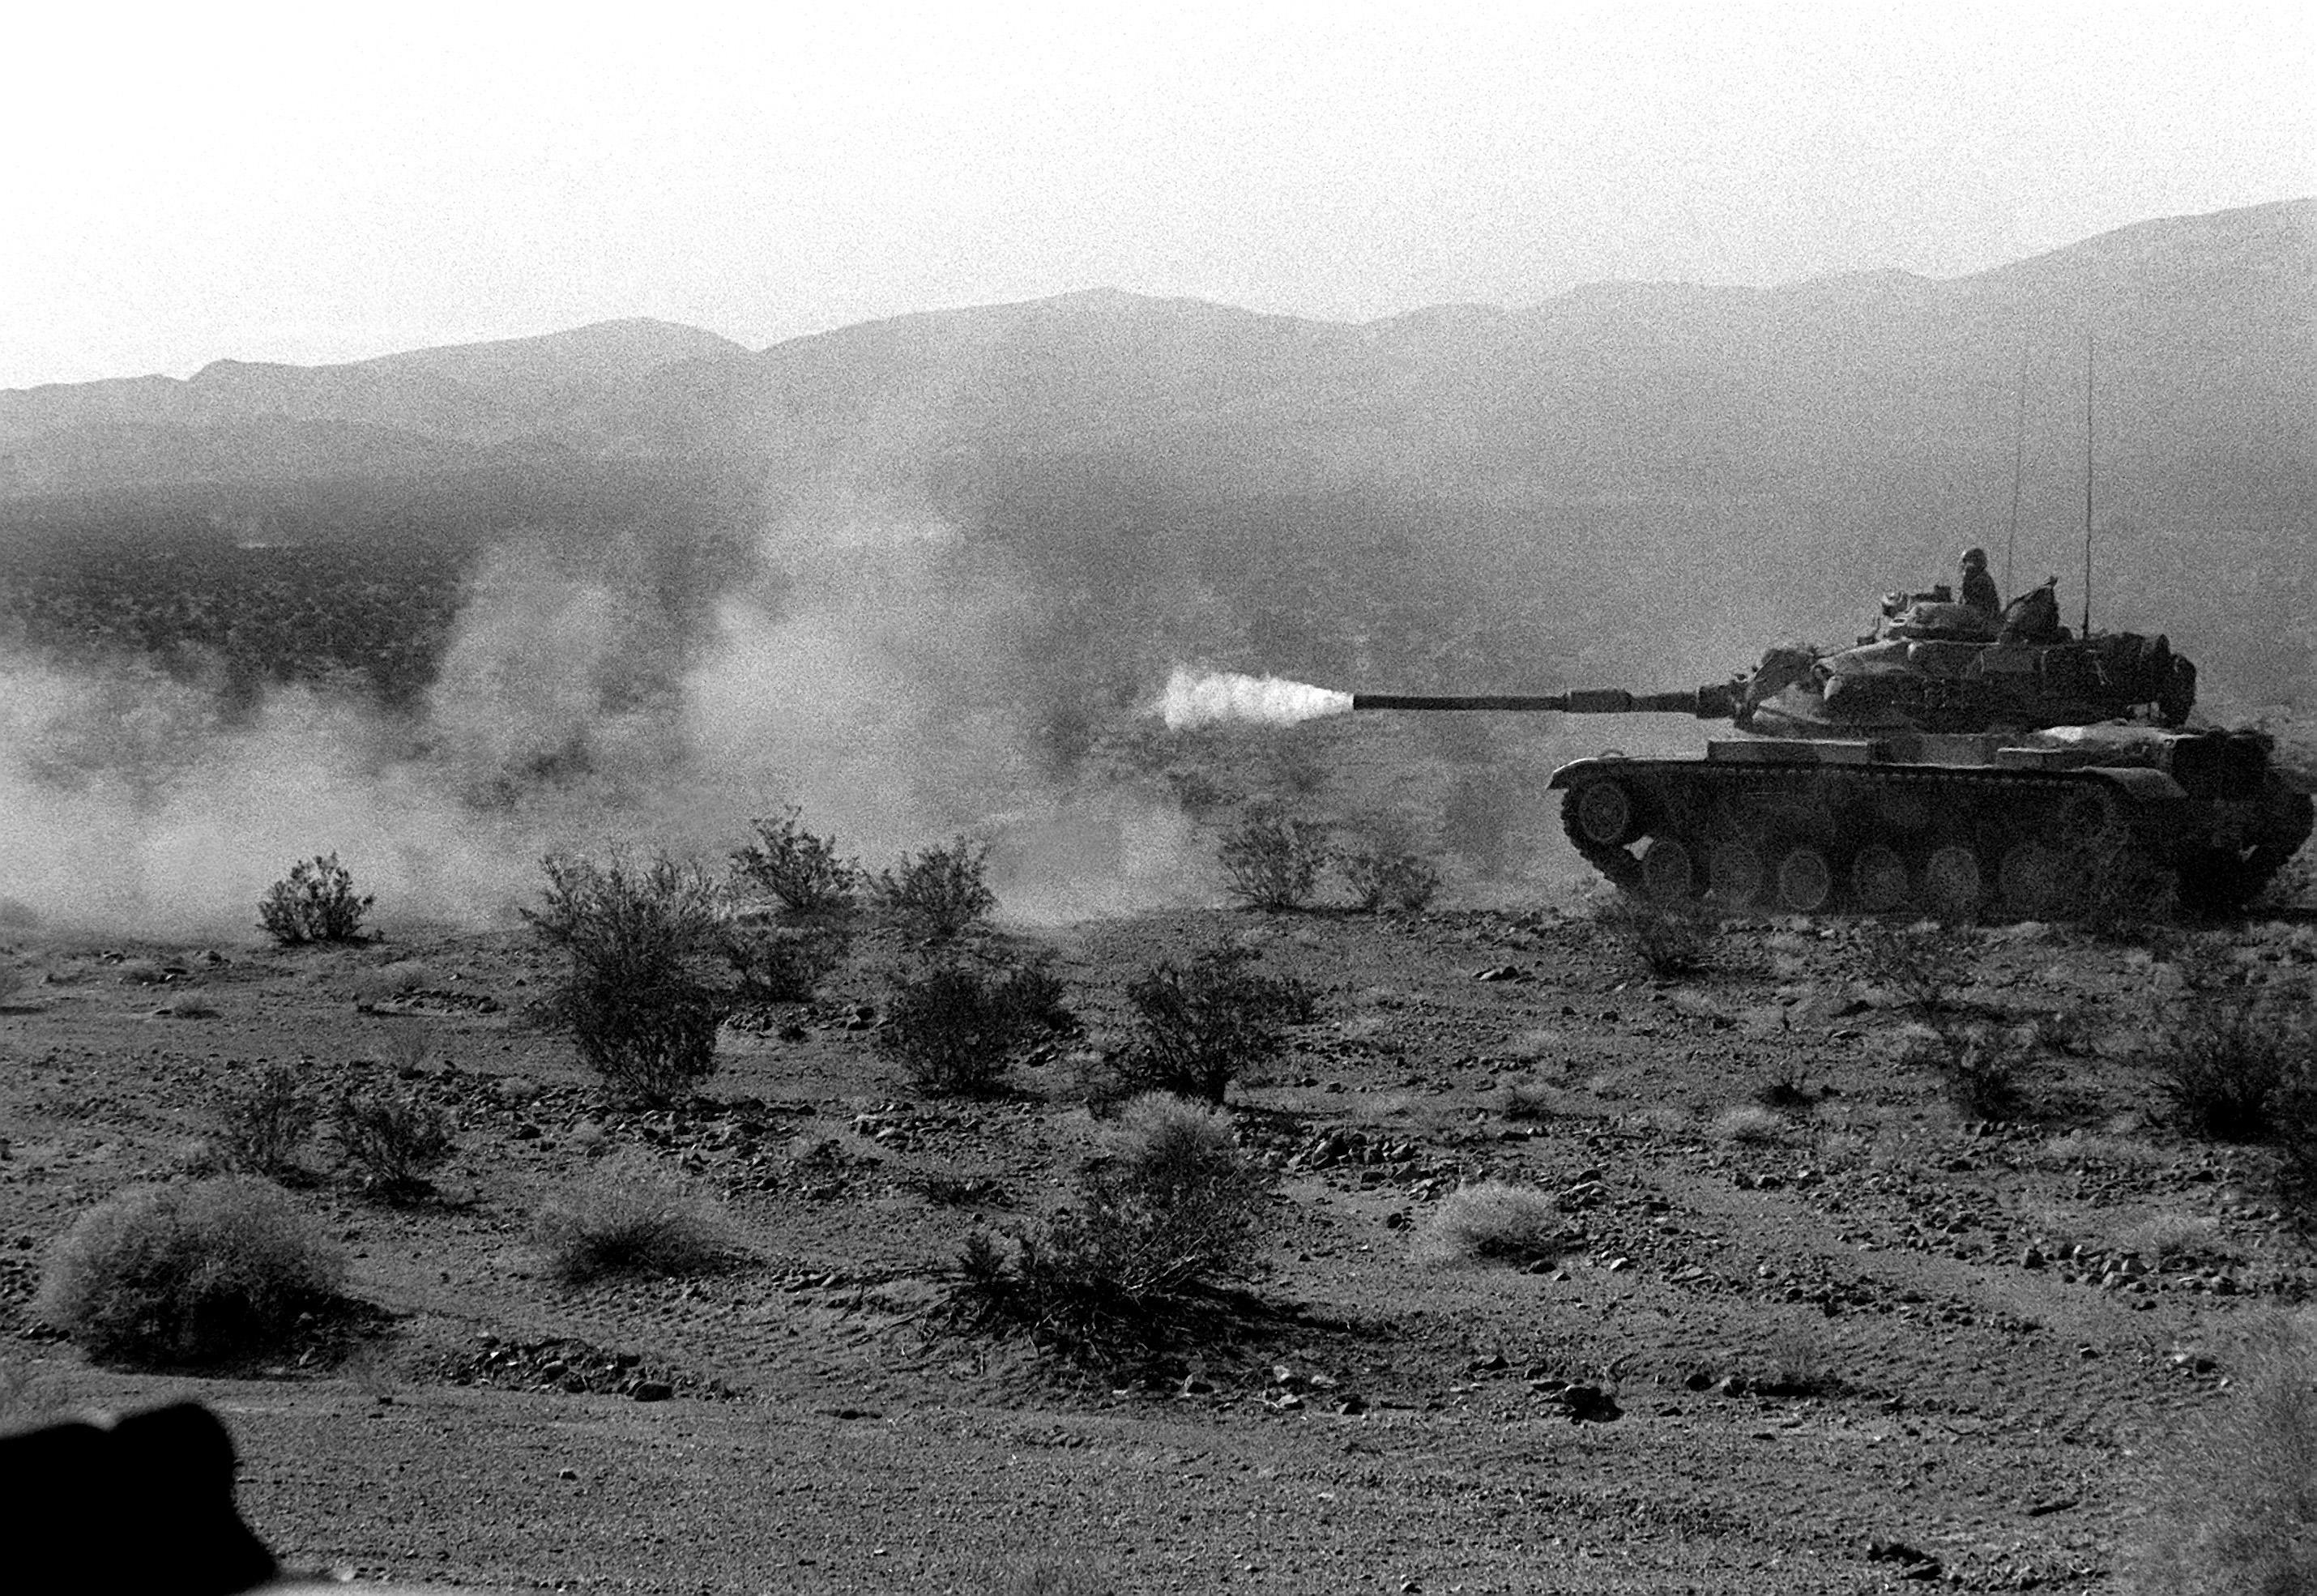 File Gallant Eagle 82 Firing M60 Tank Jpeg Wikimedia